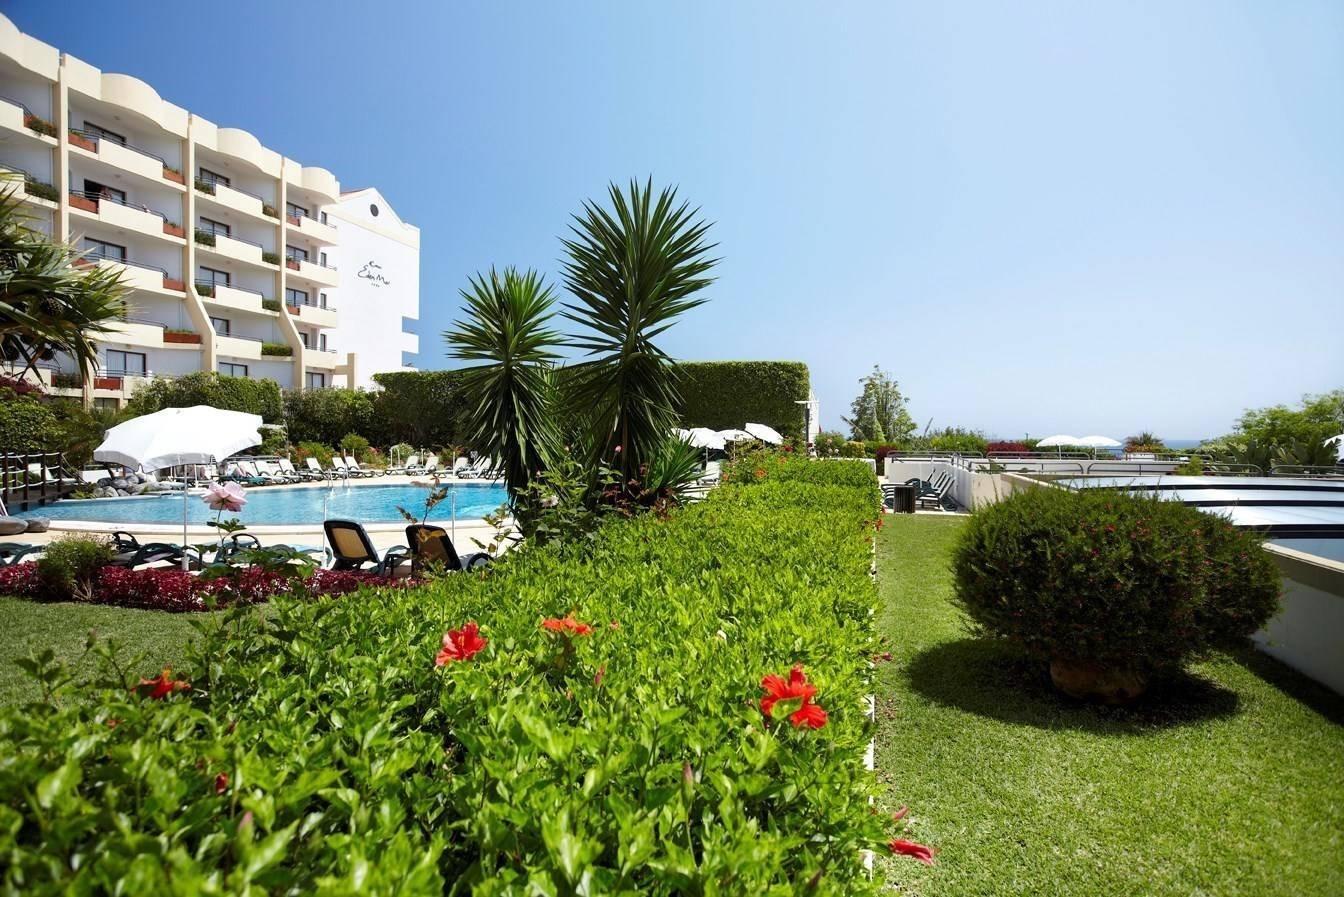 Suite Hotel Eden Mar - Madeira Island - Overview